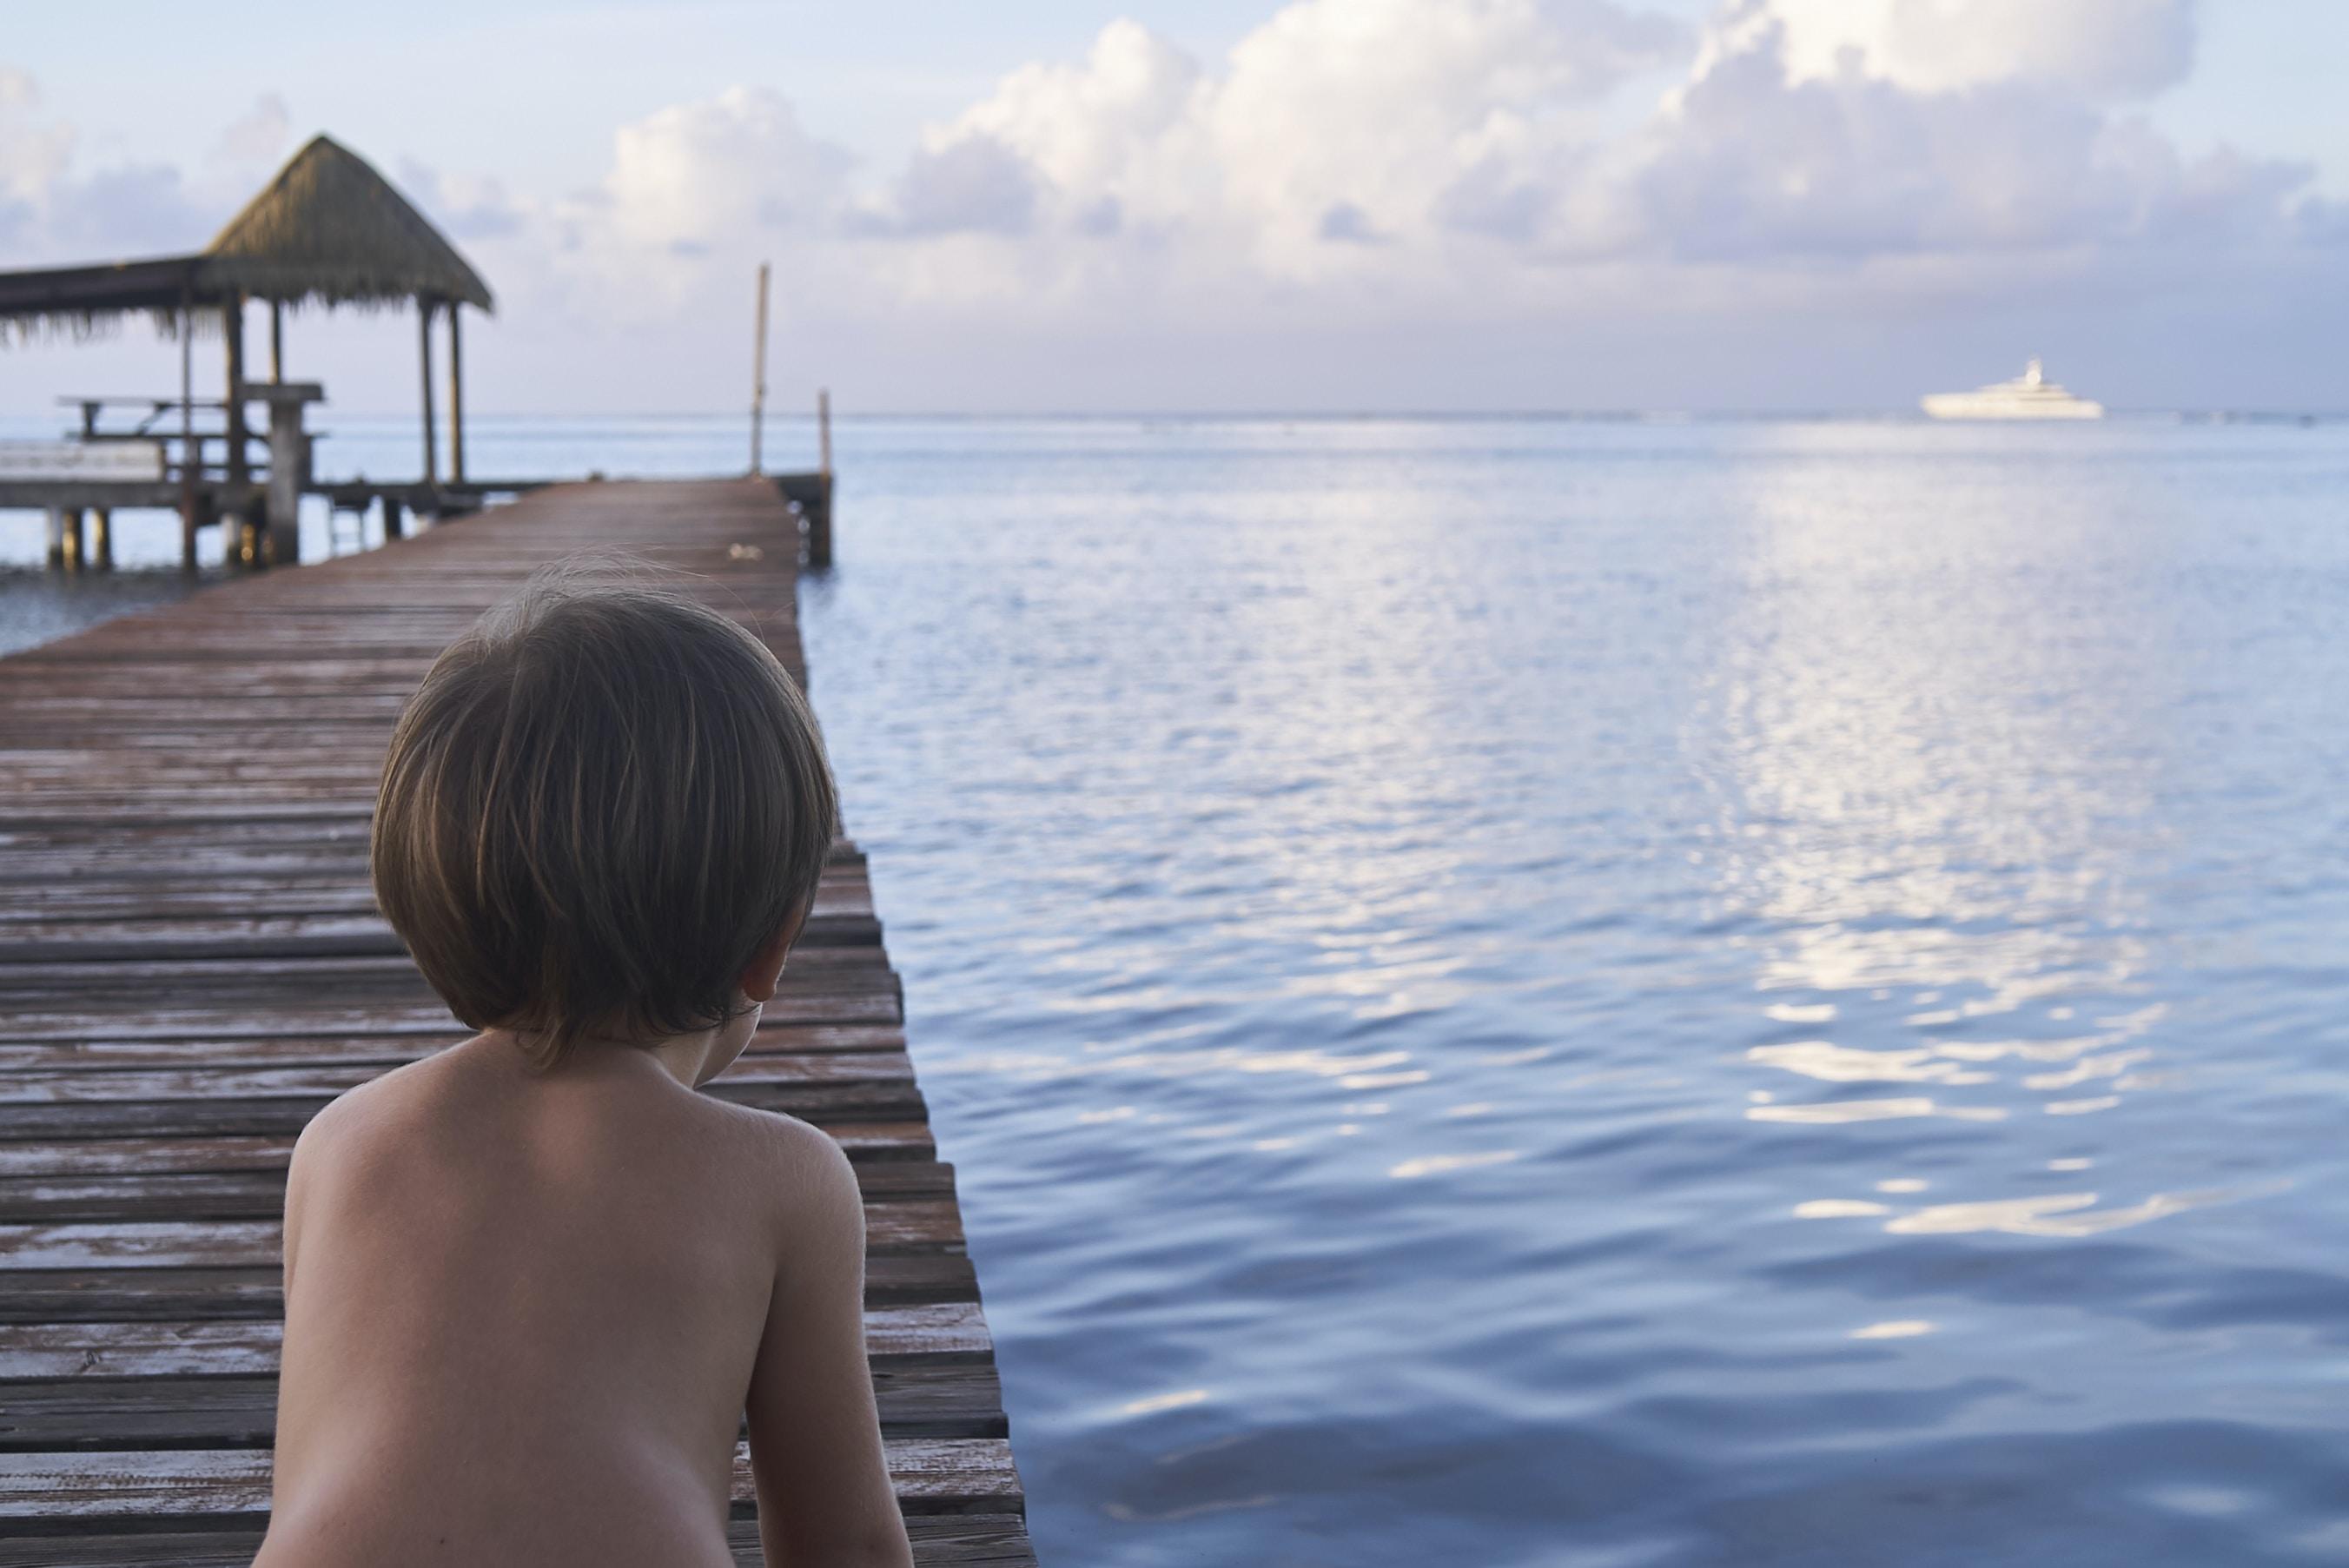 boy kneeling on wooden dock